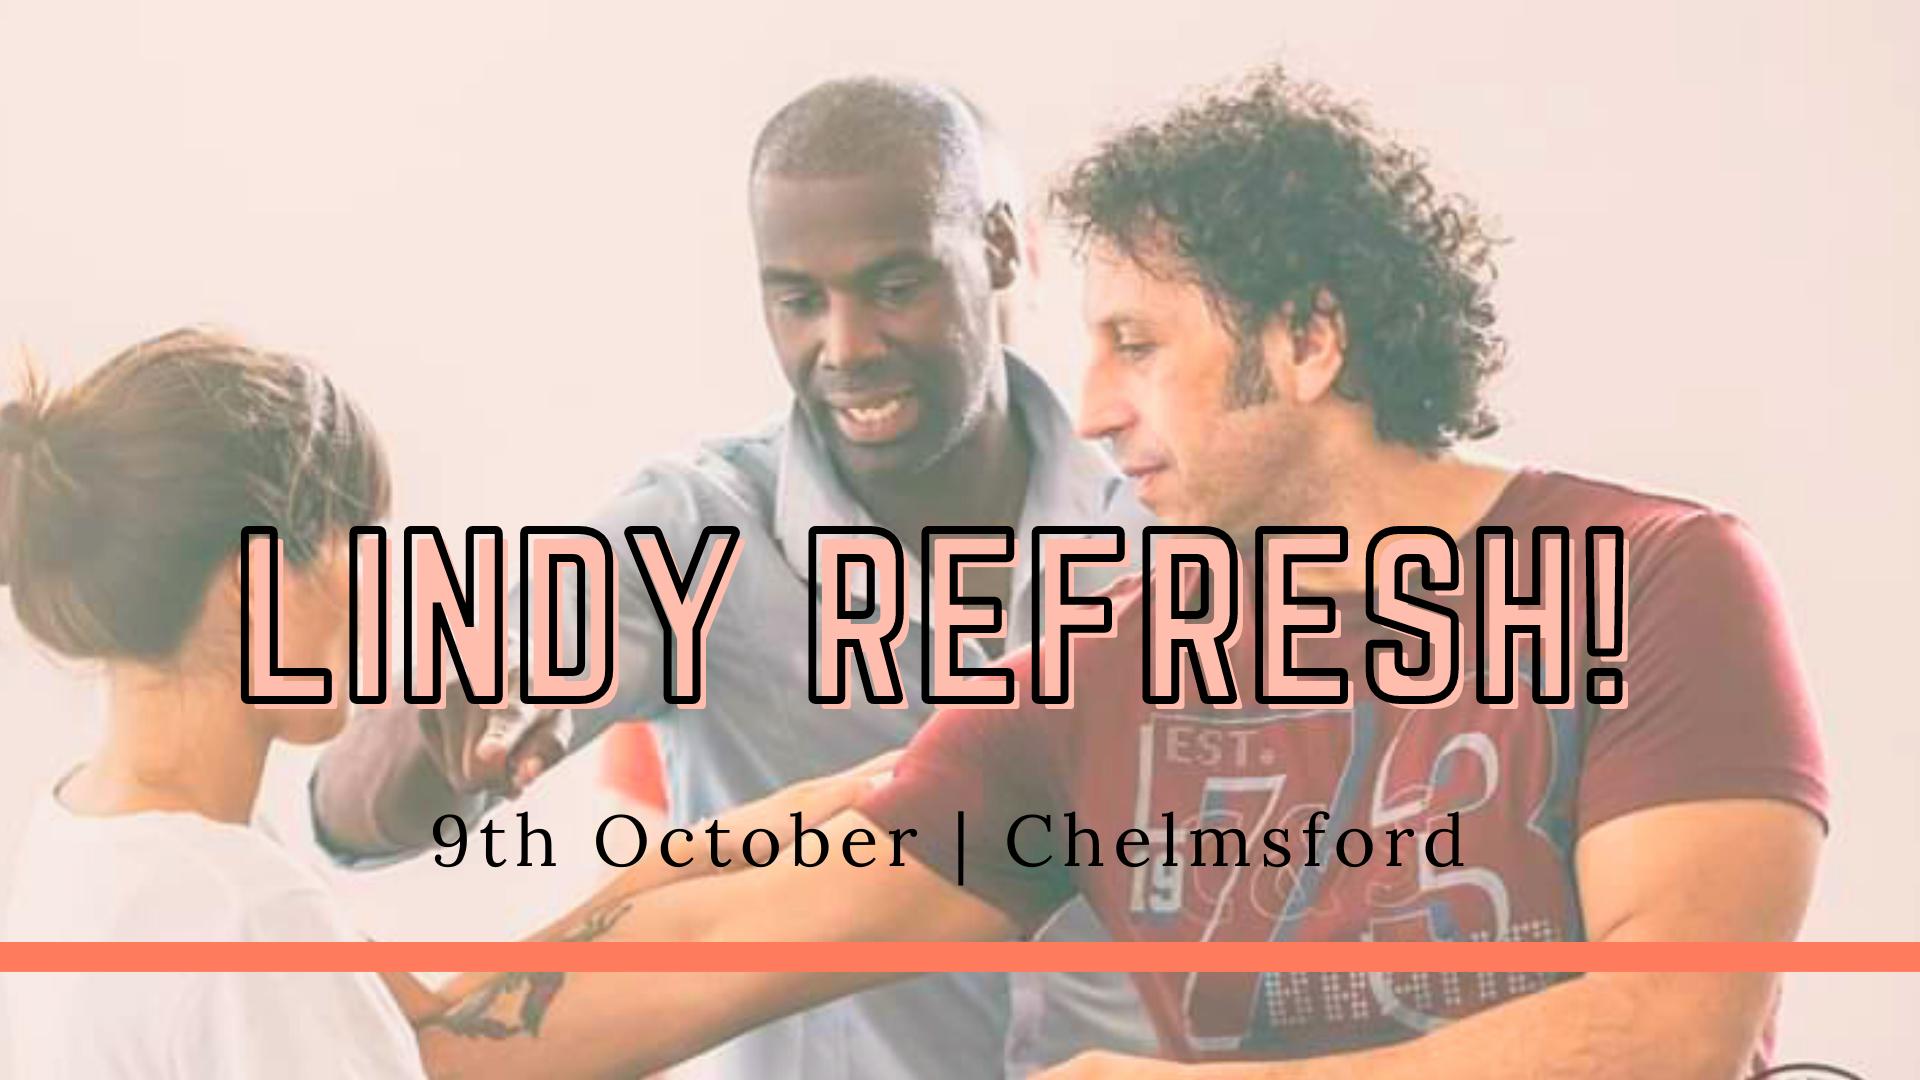 Lindy Refresh Workshop!